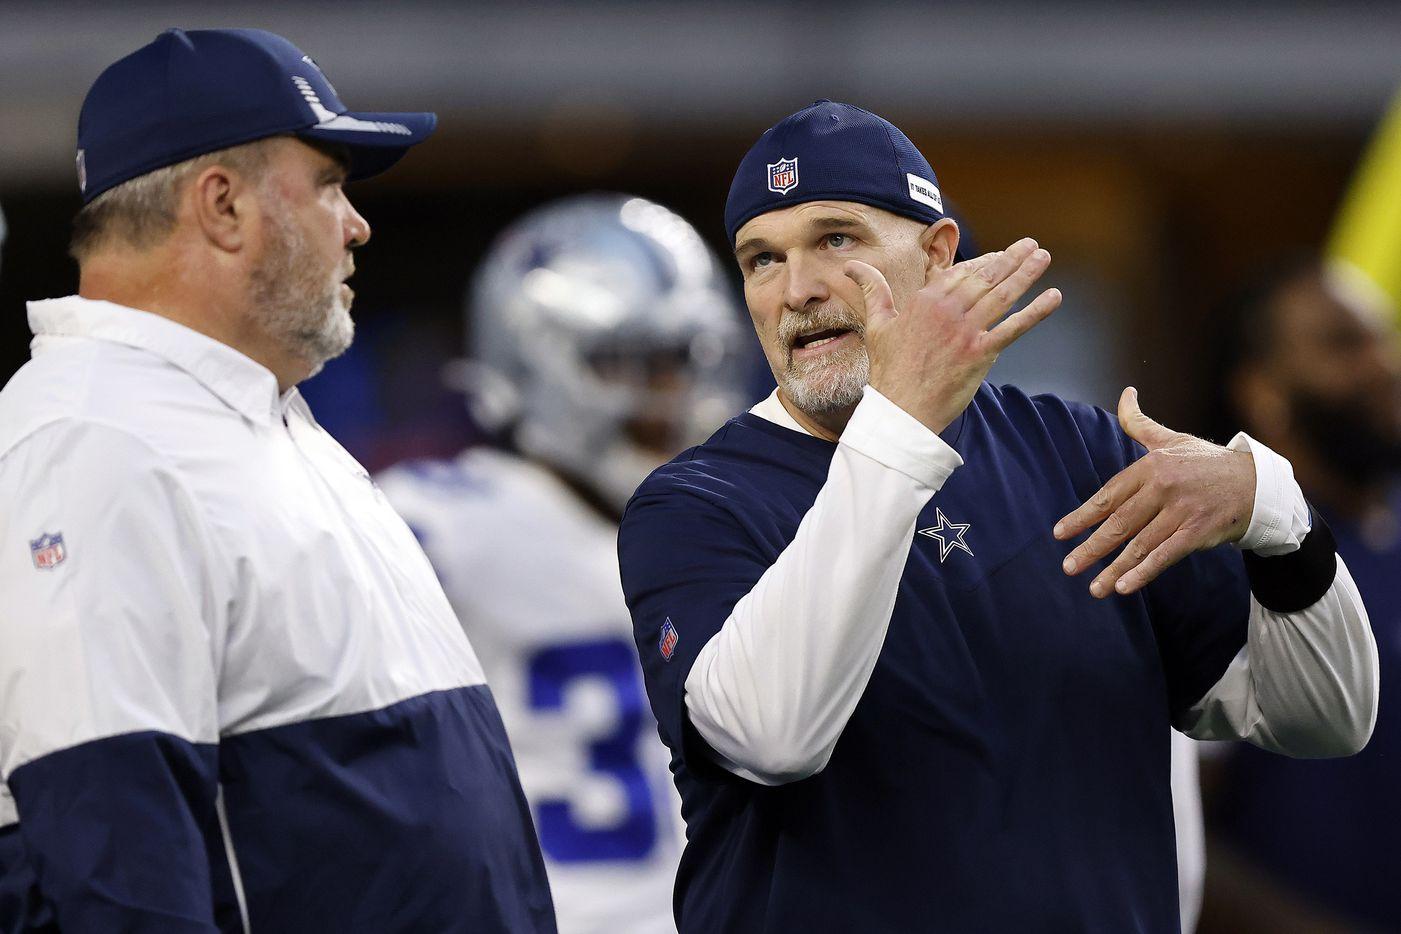 Dallas Cowboys head coach Mike McCarthy (left) listens to his defensive coordinator Dan Quinn during pregame warmups at AT&T Stadium in Arlington, Monday, September 27, 2021. (Tom Fox/The Dallas Morning News)